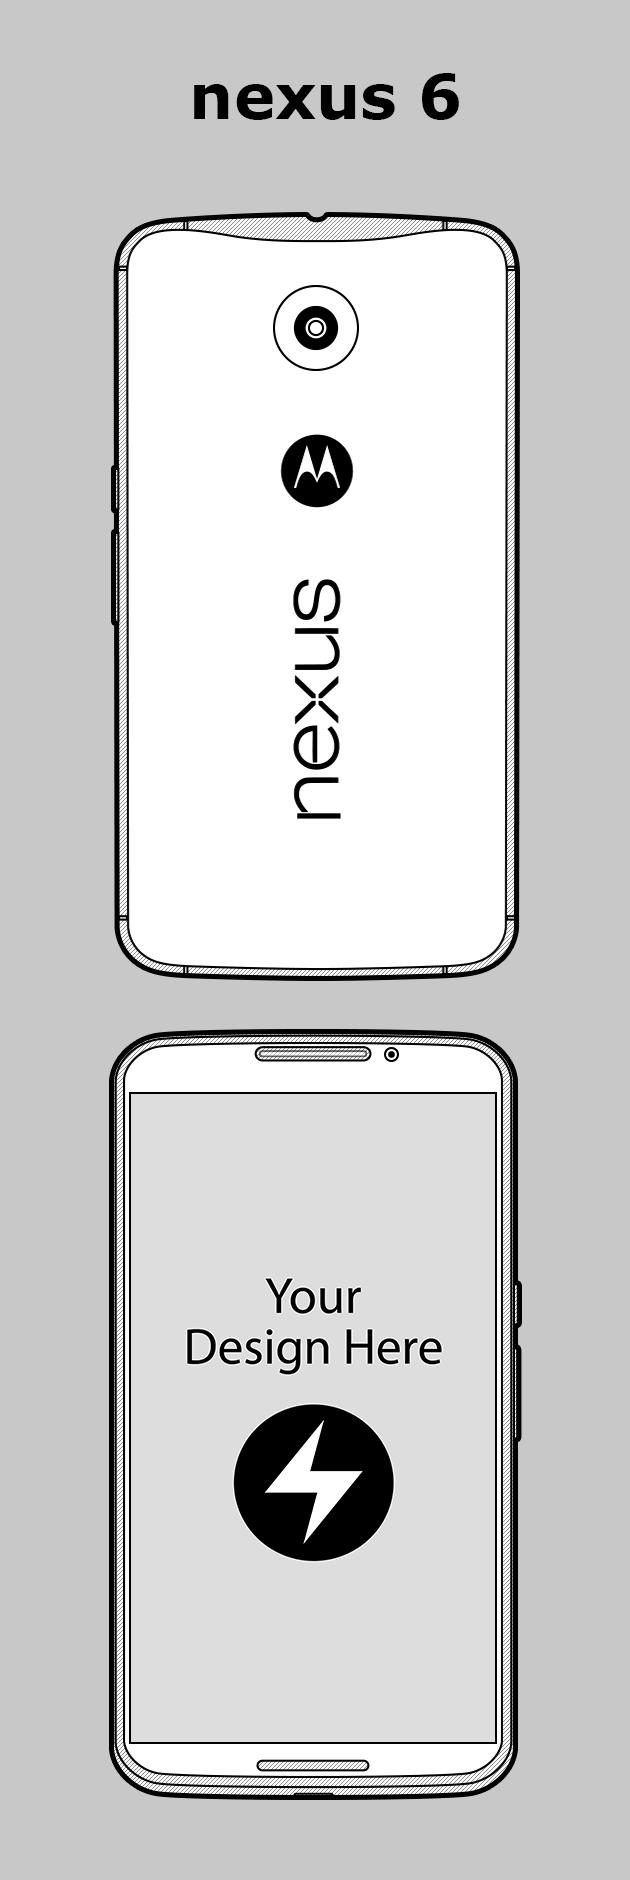 line_nexus_mockup_06